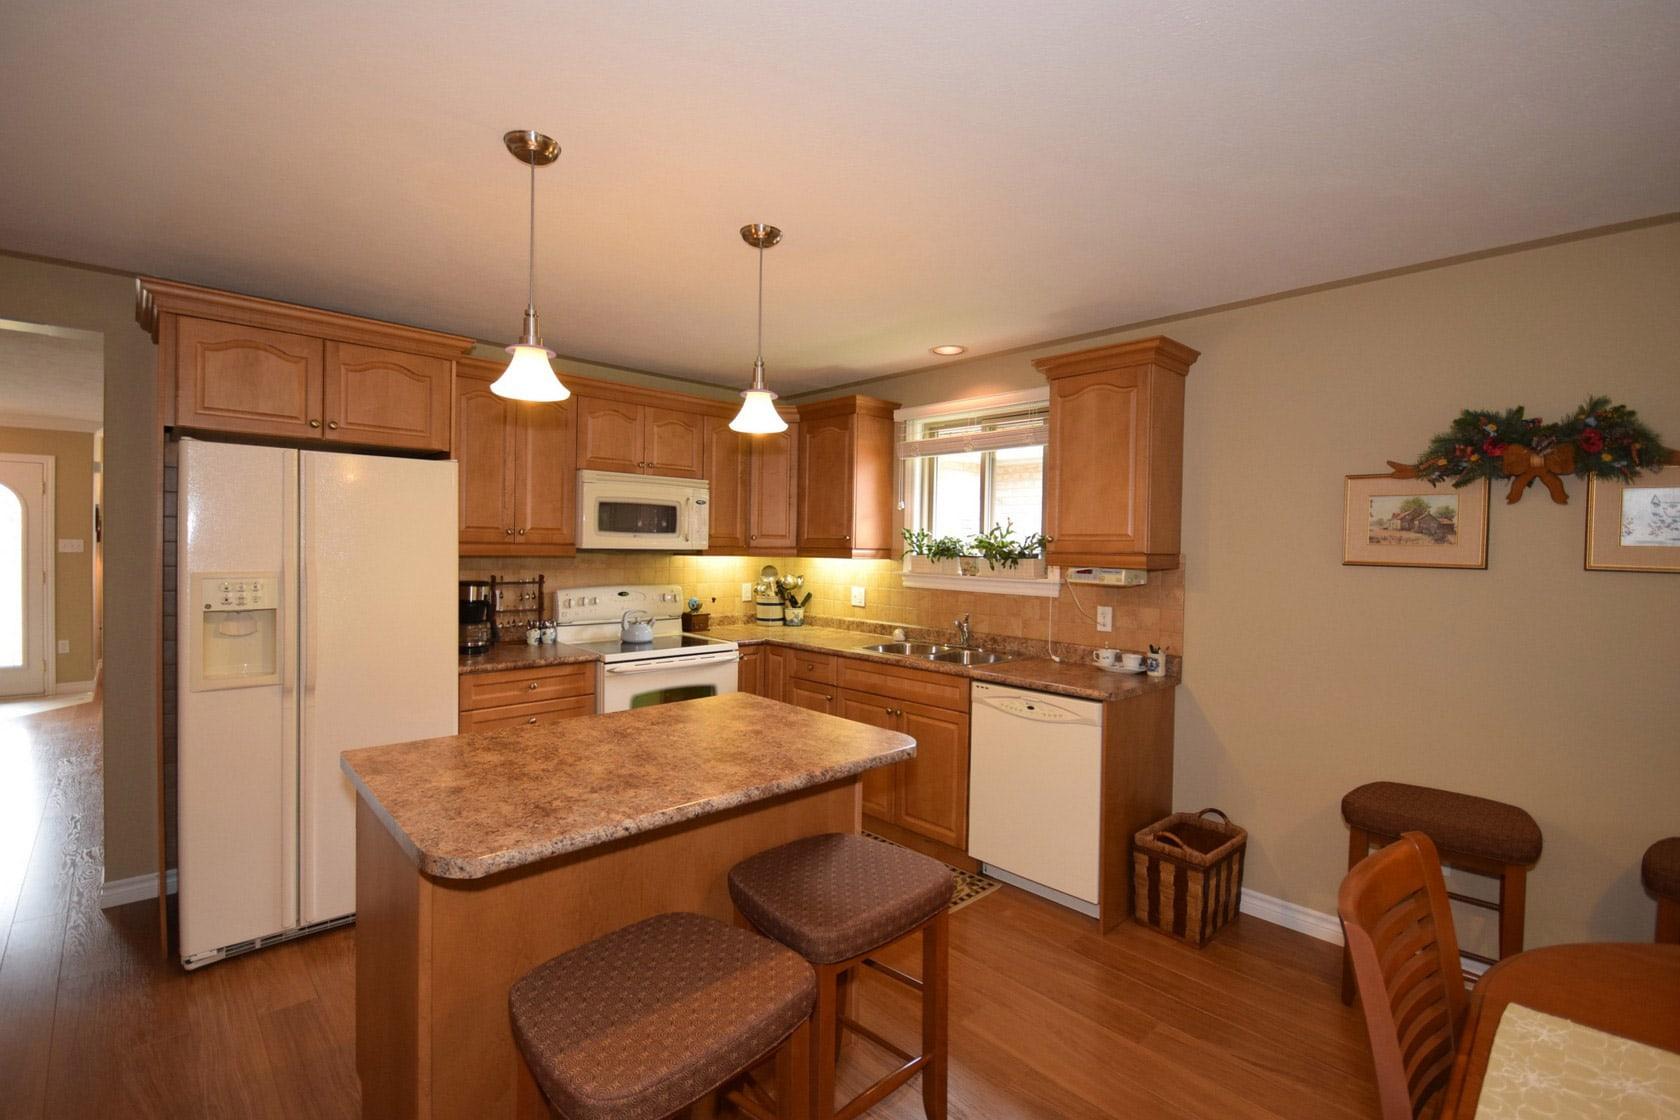 IKEA Kitchen Renovation | Part 1: The Design Process - Northern Nester